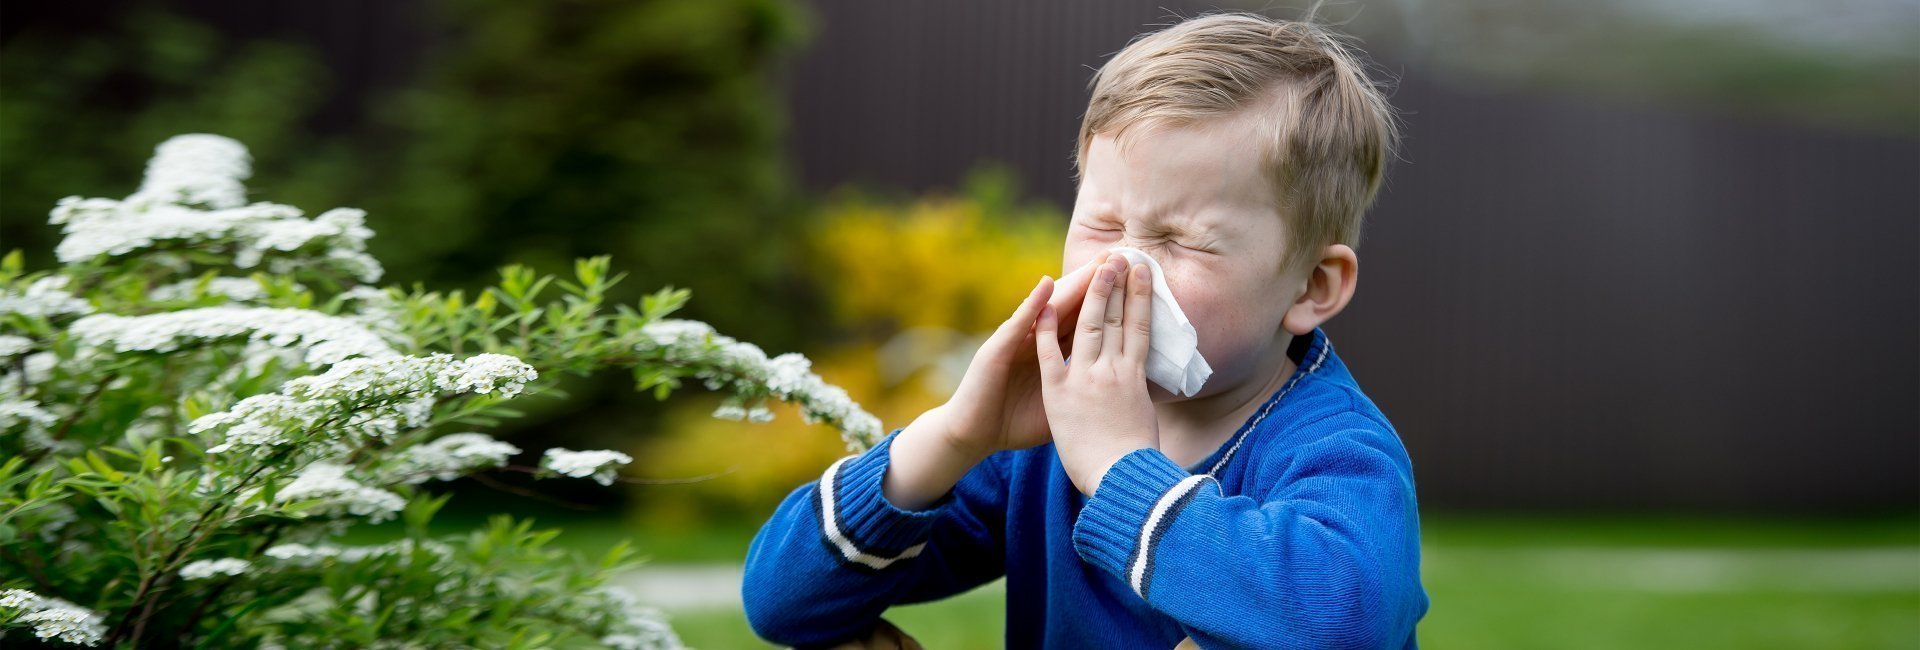 Поллиноз – пыльцевая аллергия